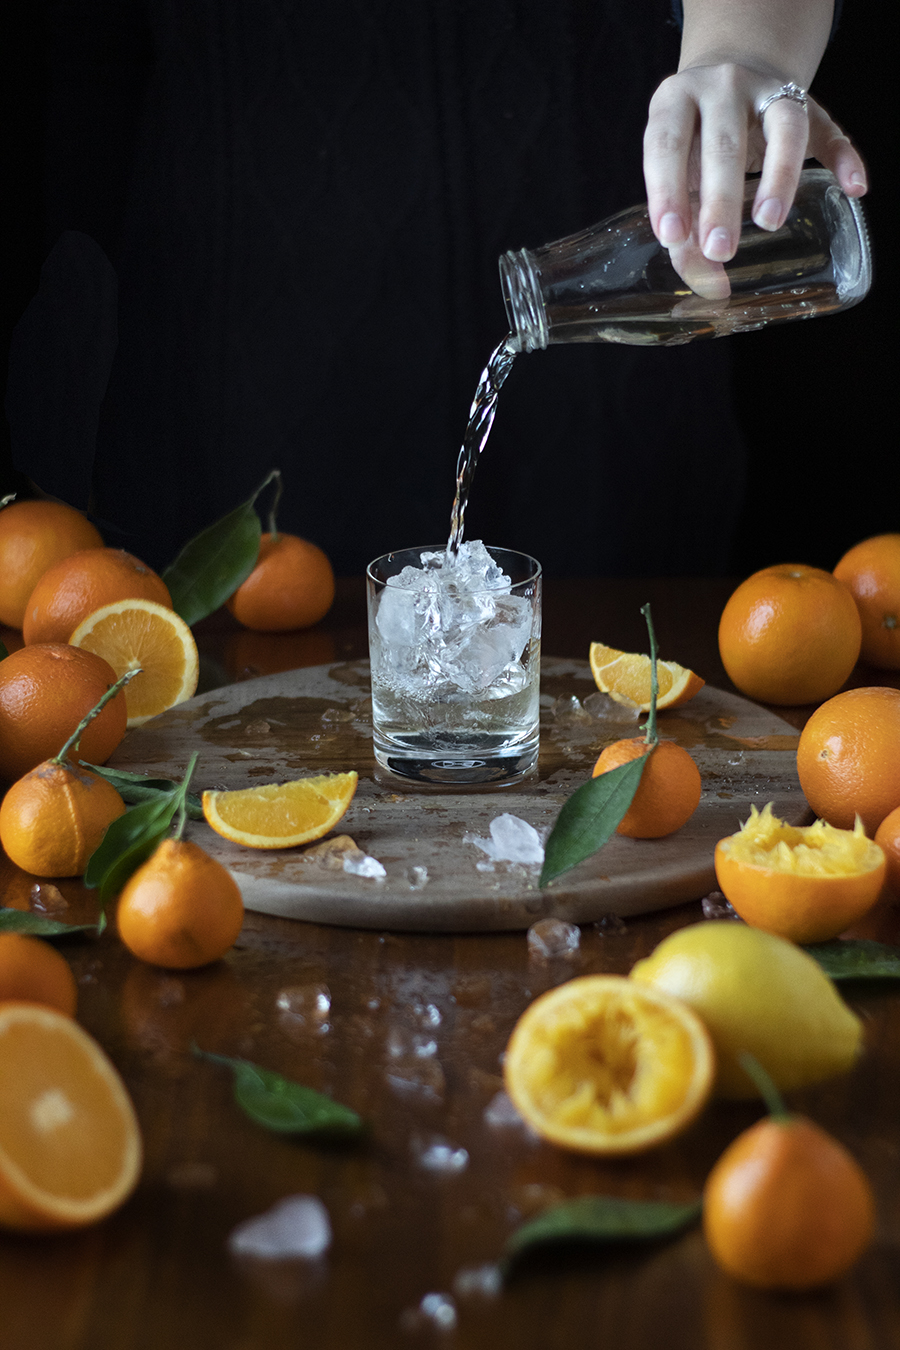 how to make a crystal clear milk clarified screwdriver with satsuma mandarin juice